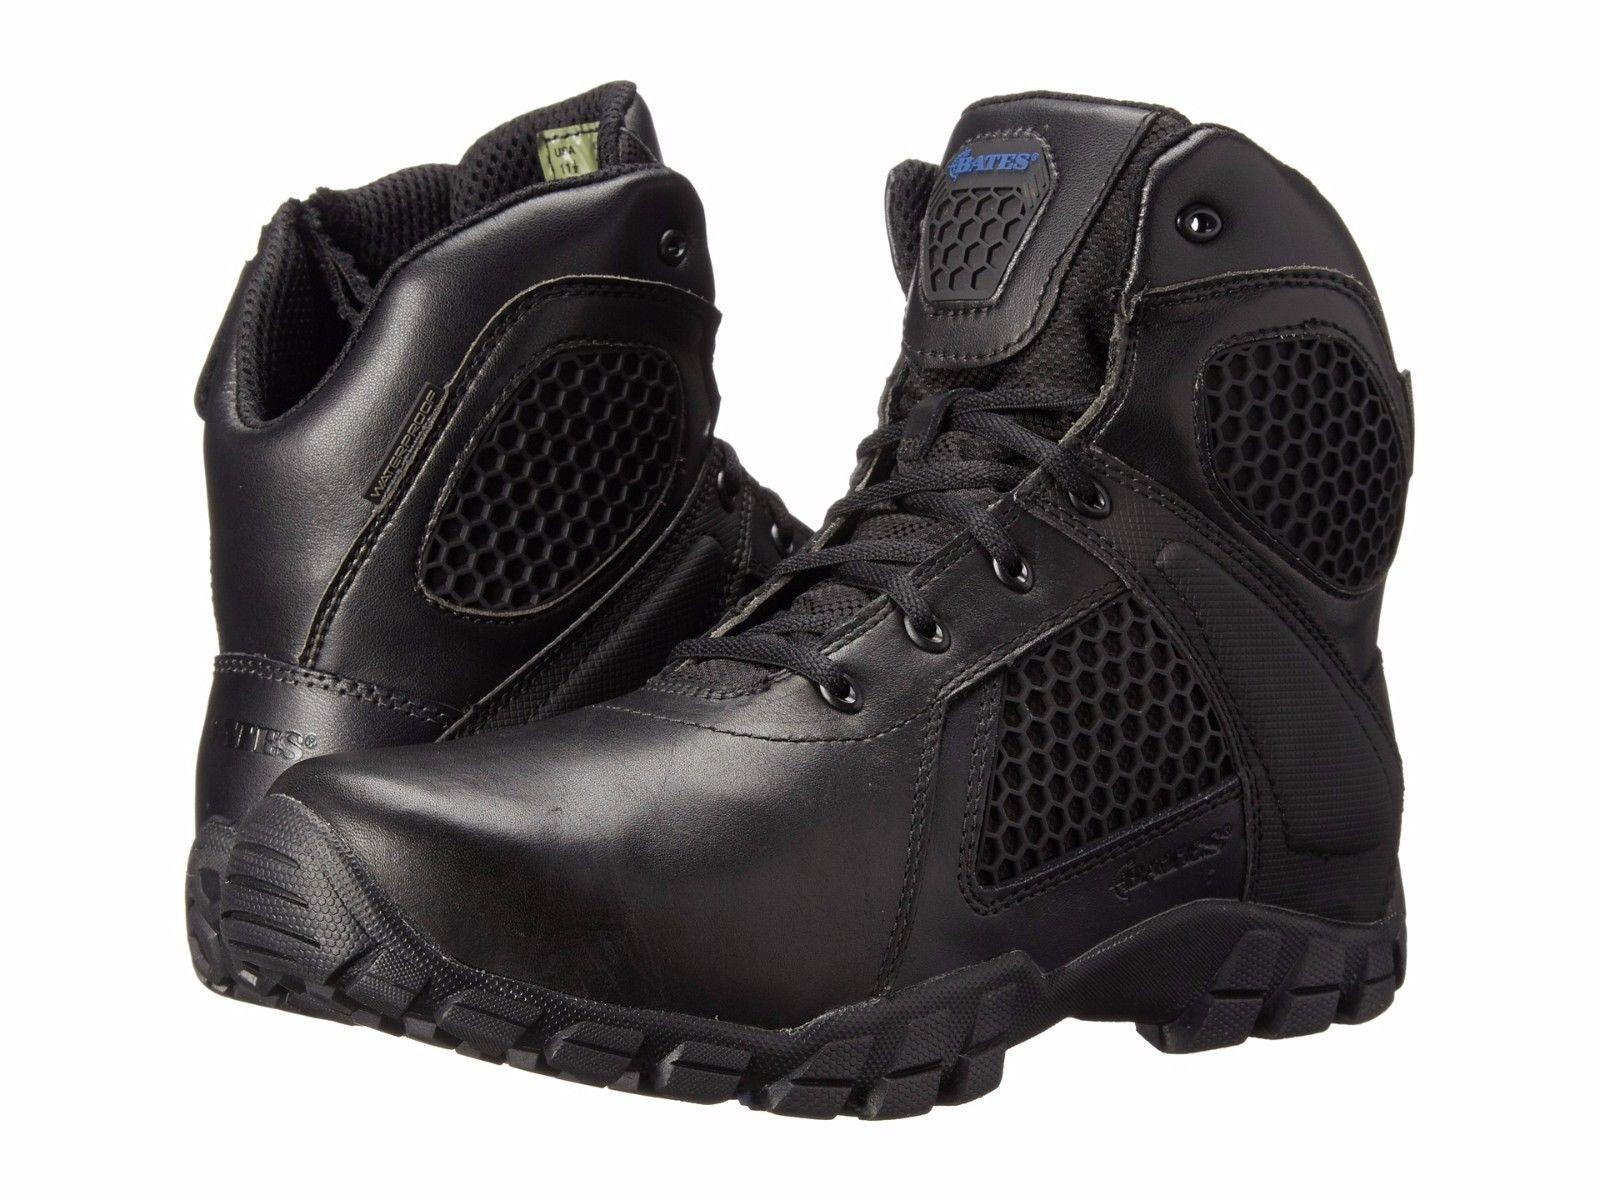 "Bates 7006 Strike 6"" black Dura-Flex non-safety combat service boot size 6-11"